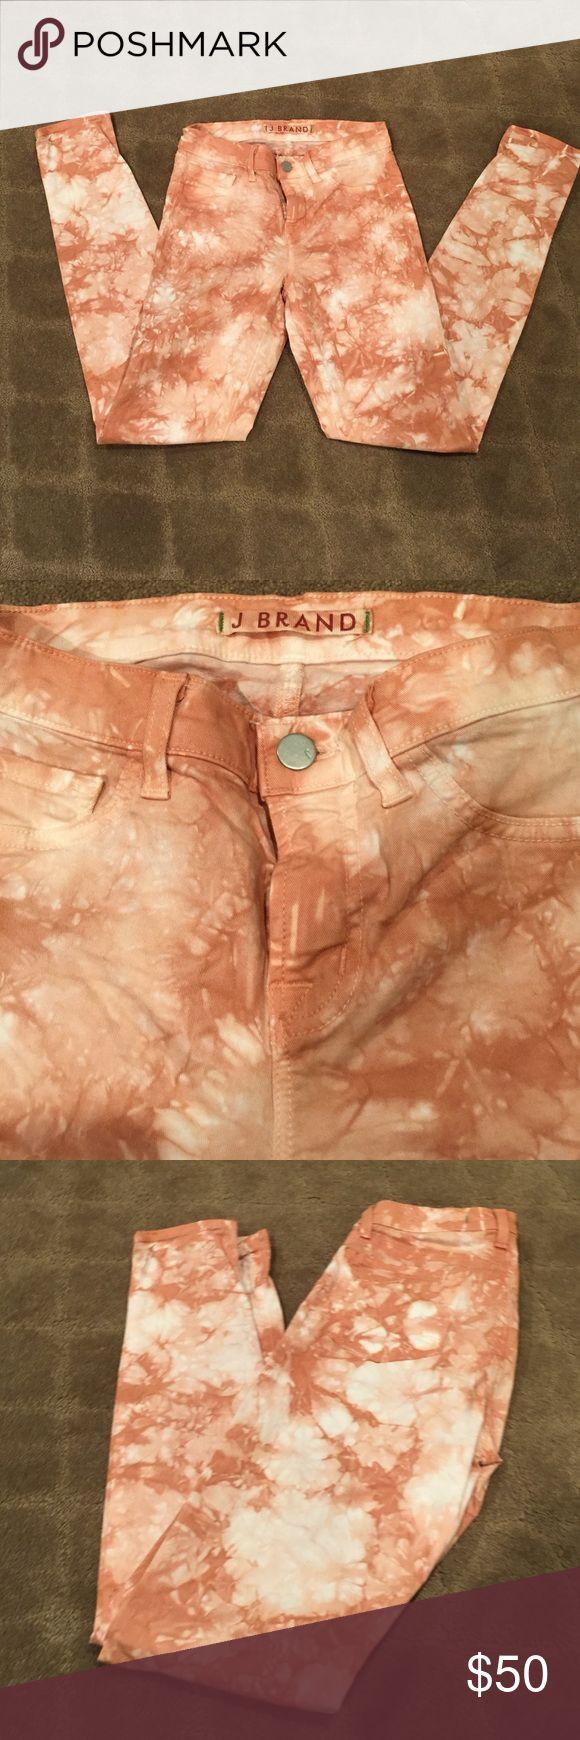 J Brand Tye Dye Jeans J brand skinny jeans. Size 26. Excellent condition J Brand Jeans Skinny